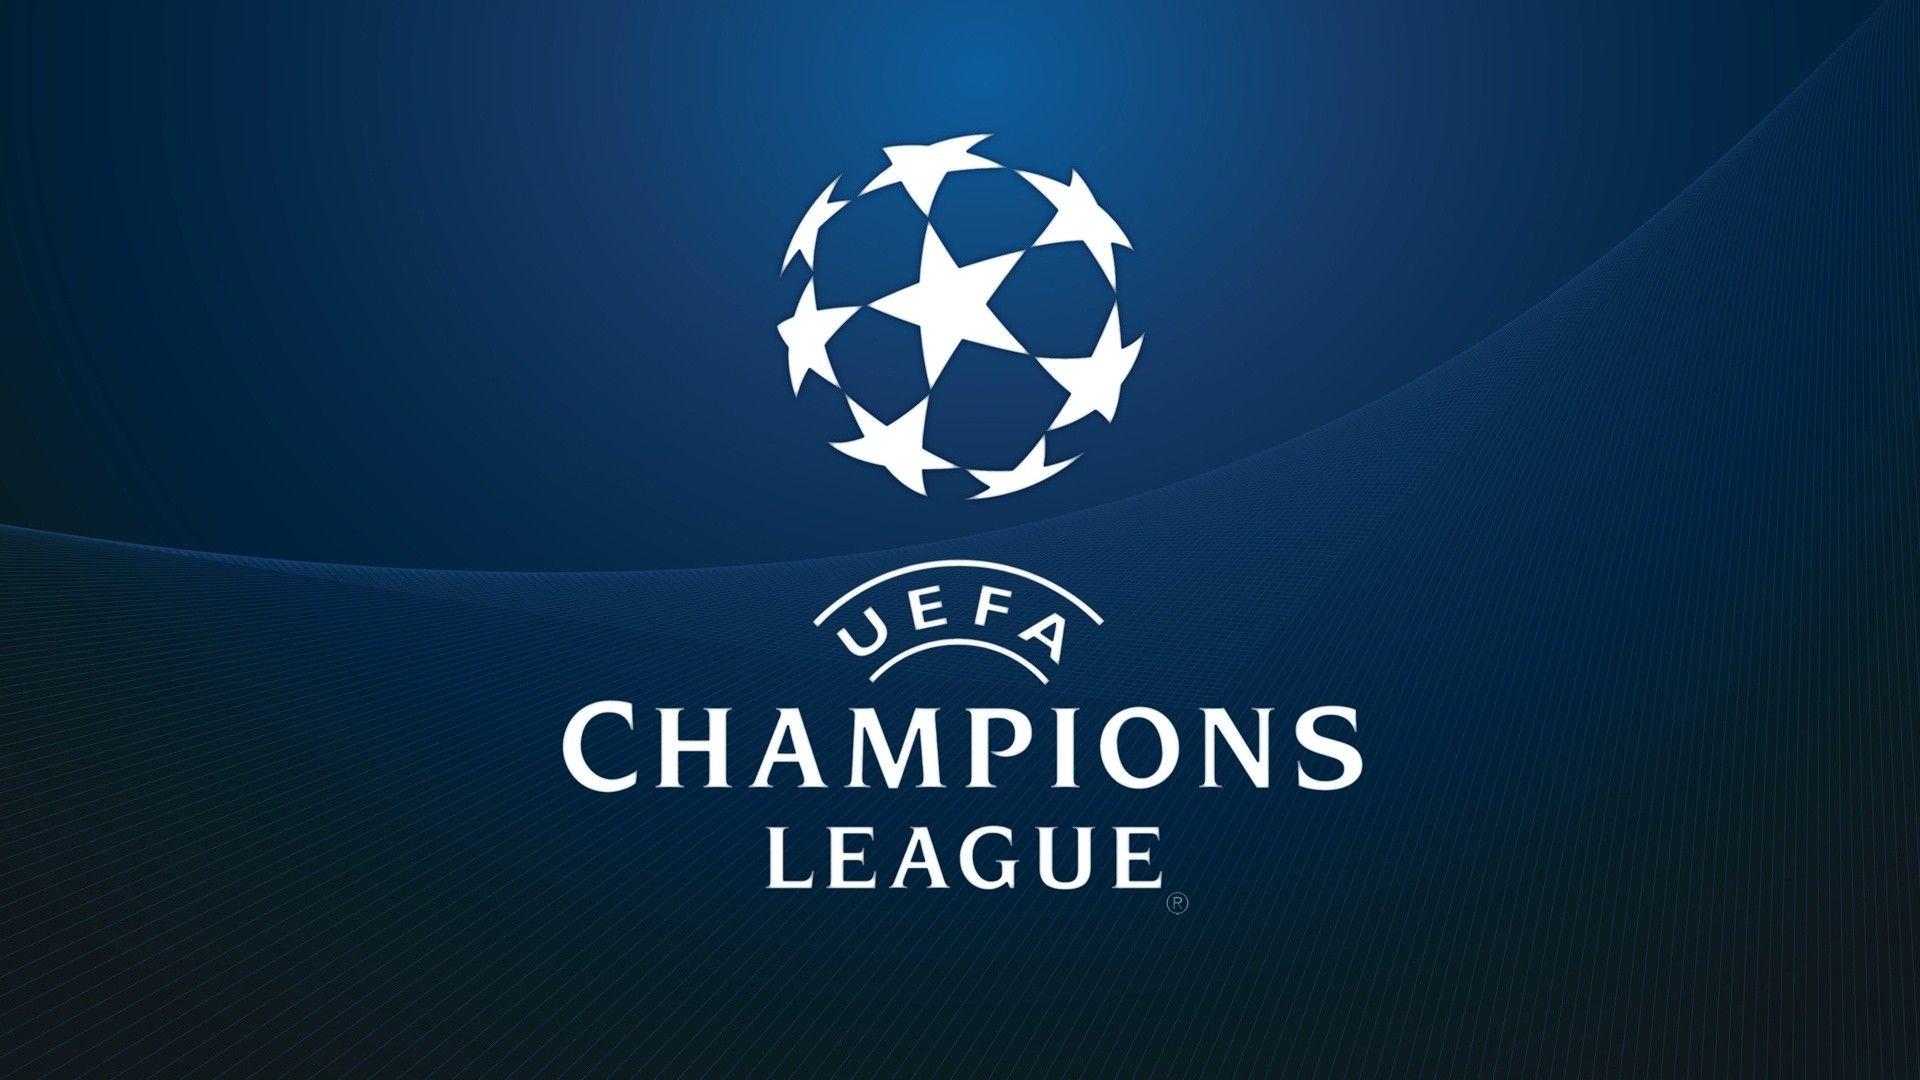 Uefa Champions League Logo Hd Wallpaper Uefa Champions Liga De